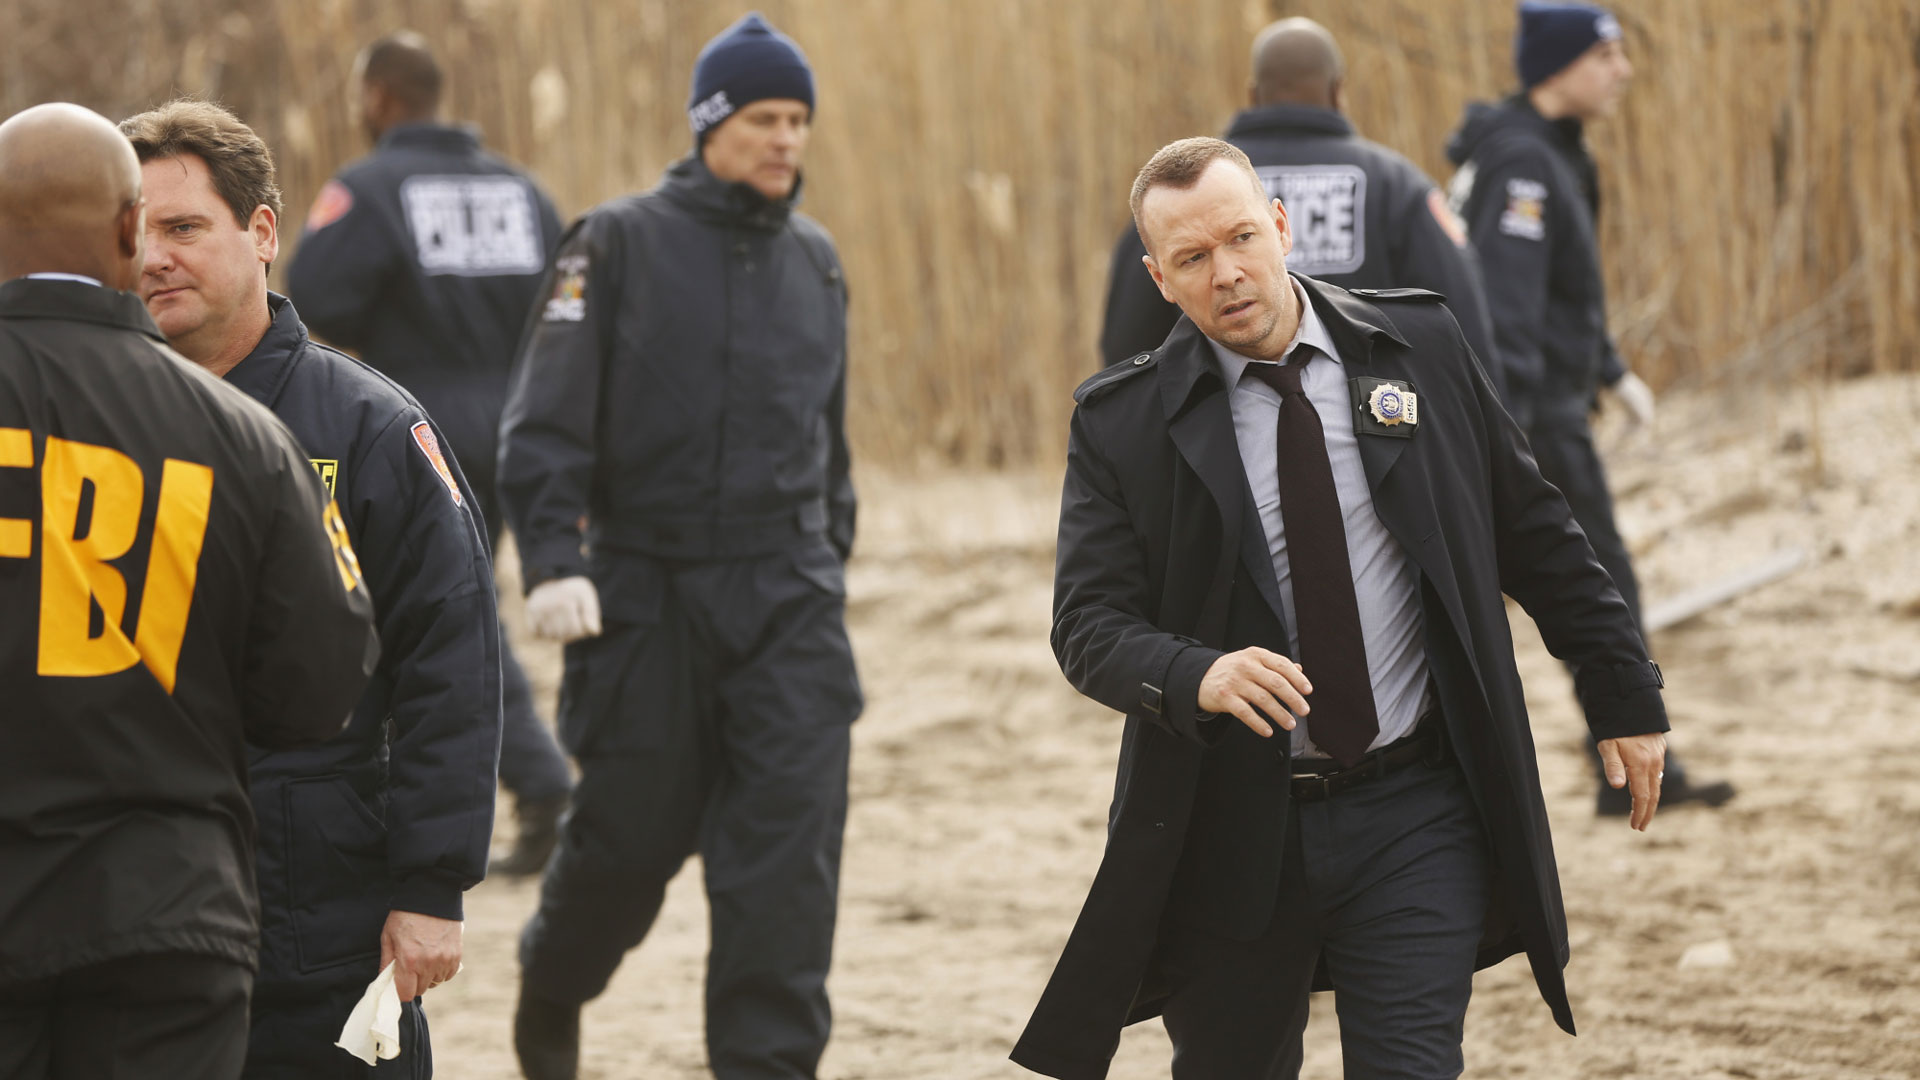 Detective Danny Reagan approaches a crime scene.